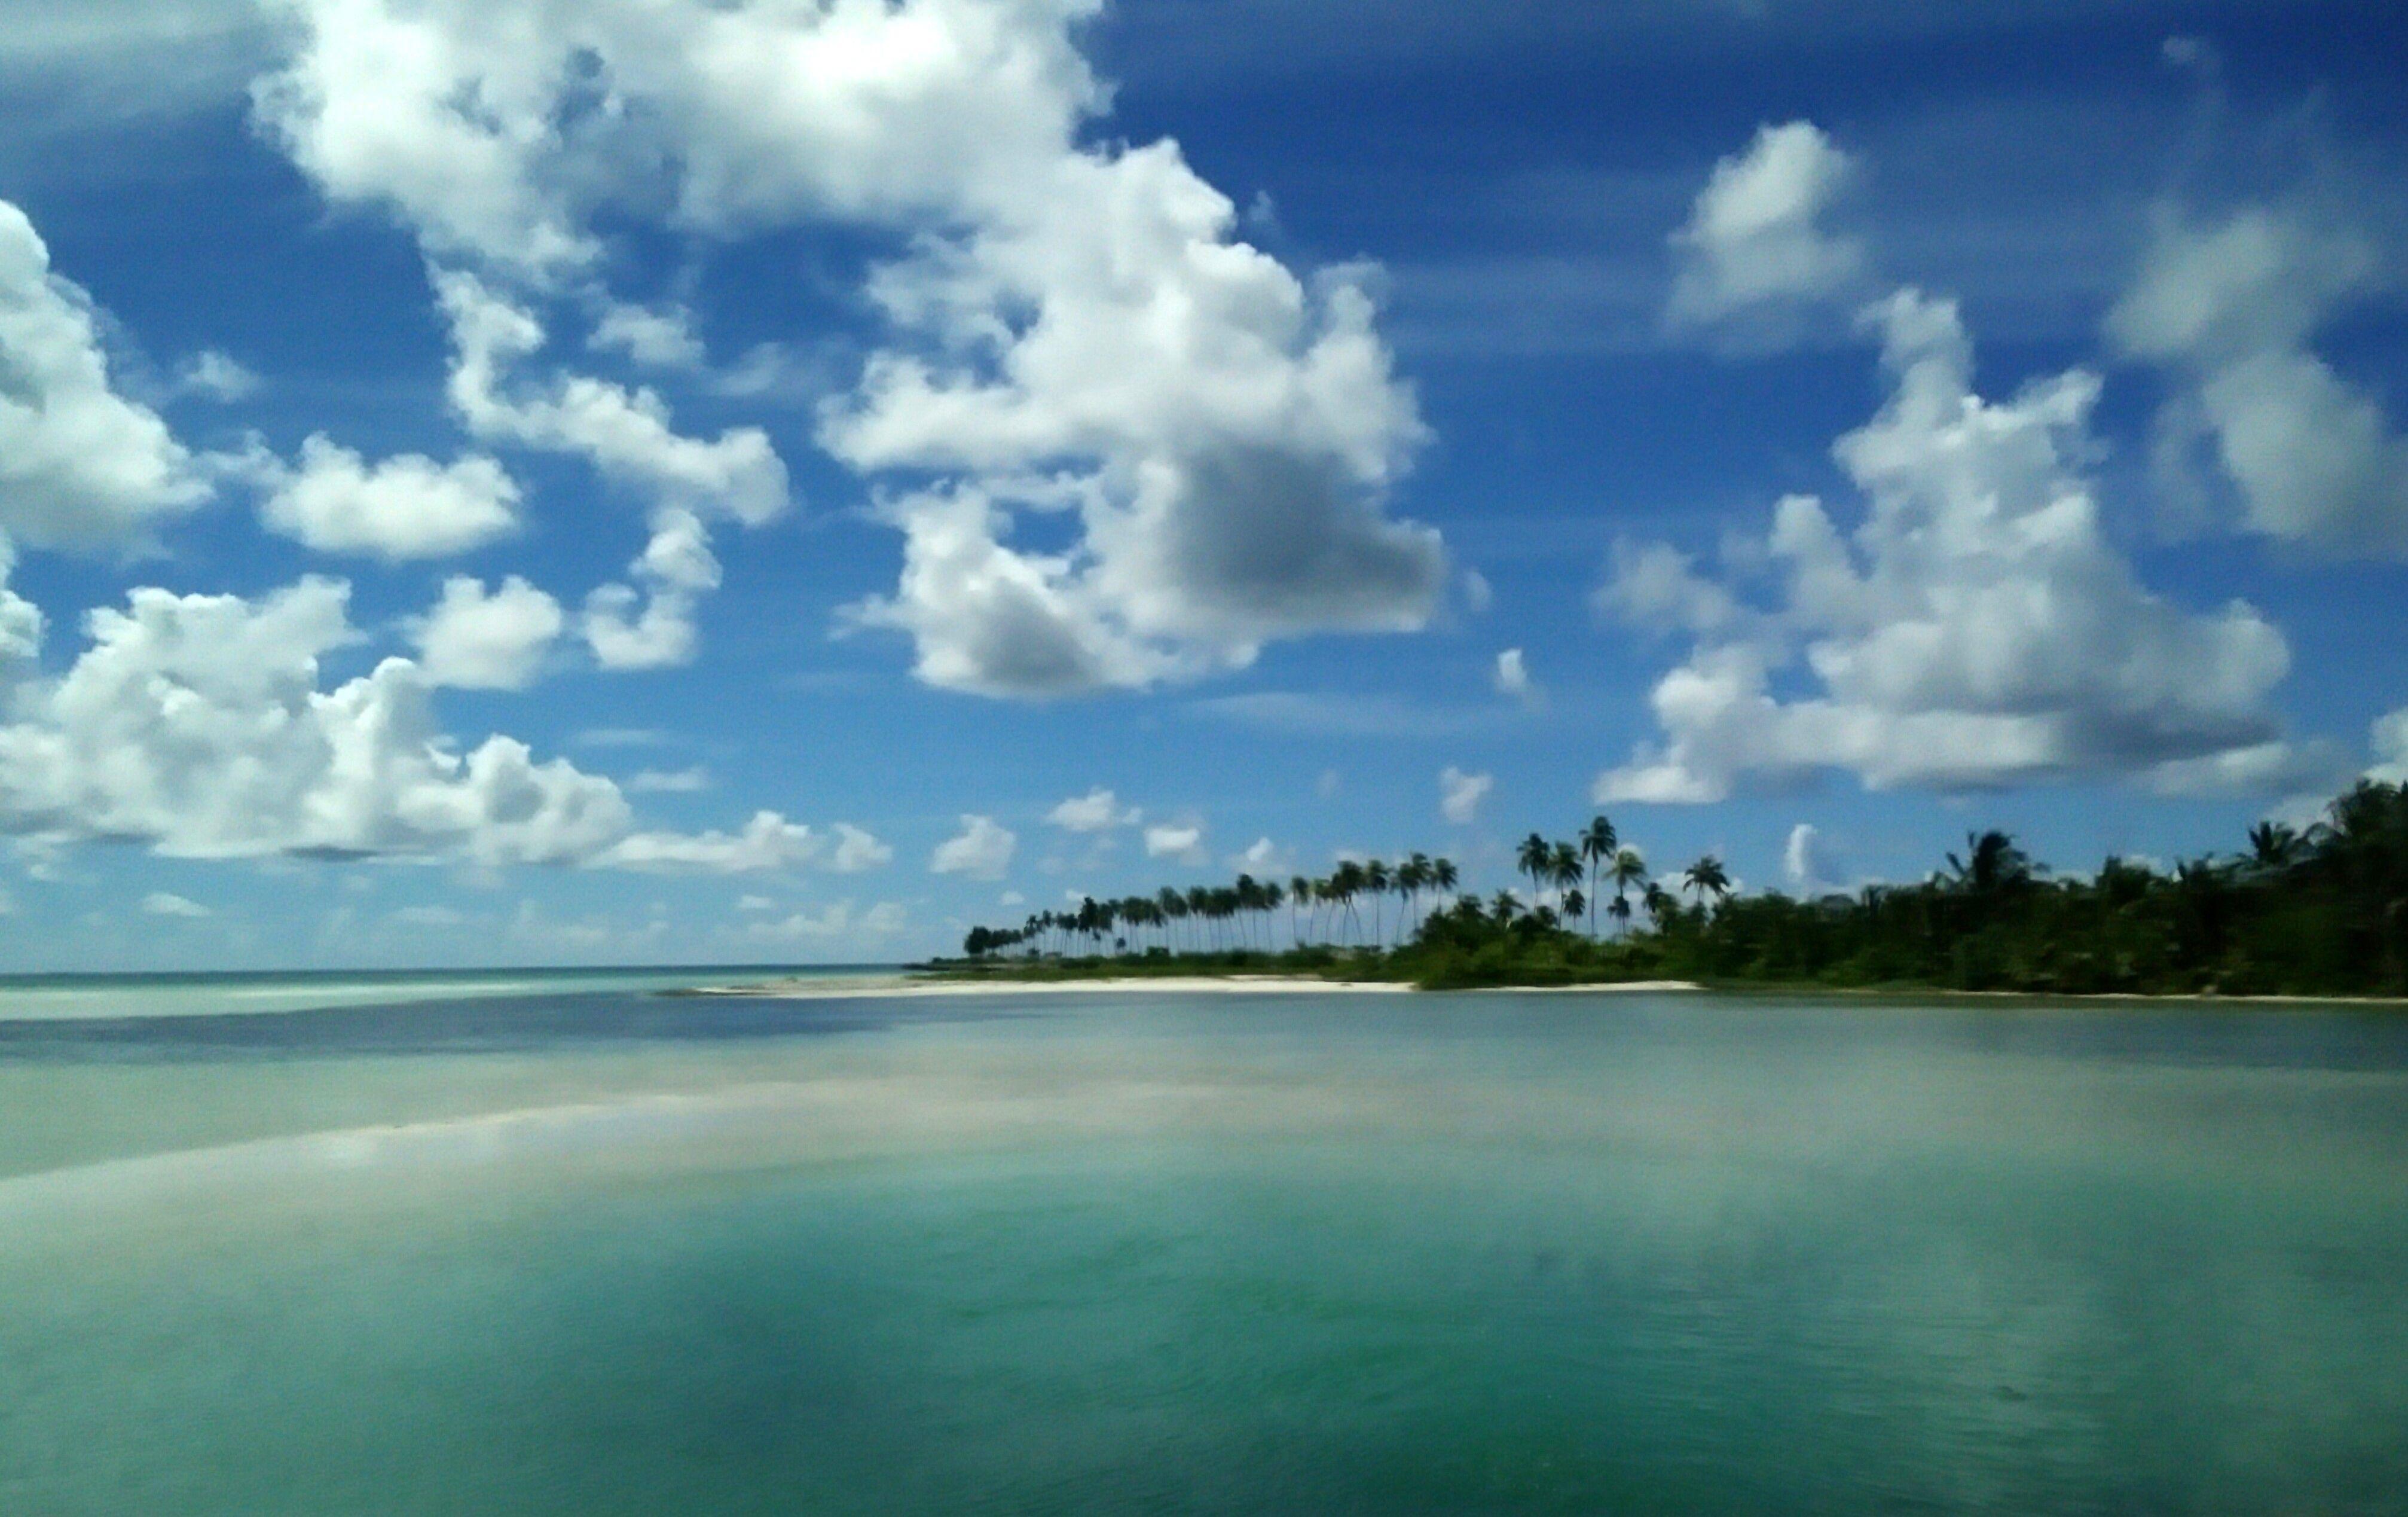 Discover untouched beauty of Maldives #travel #nature #Maldives